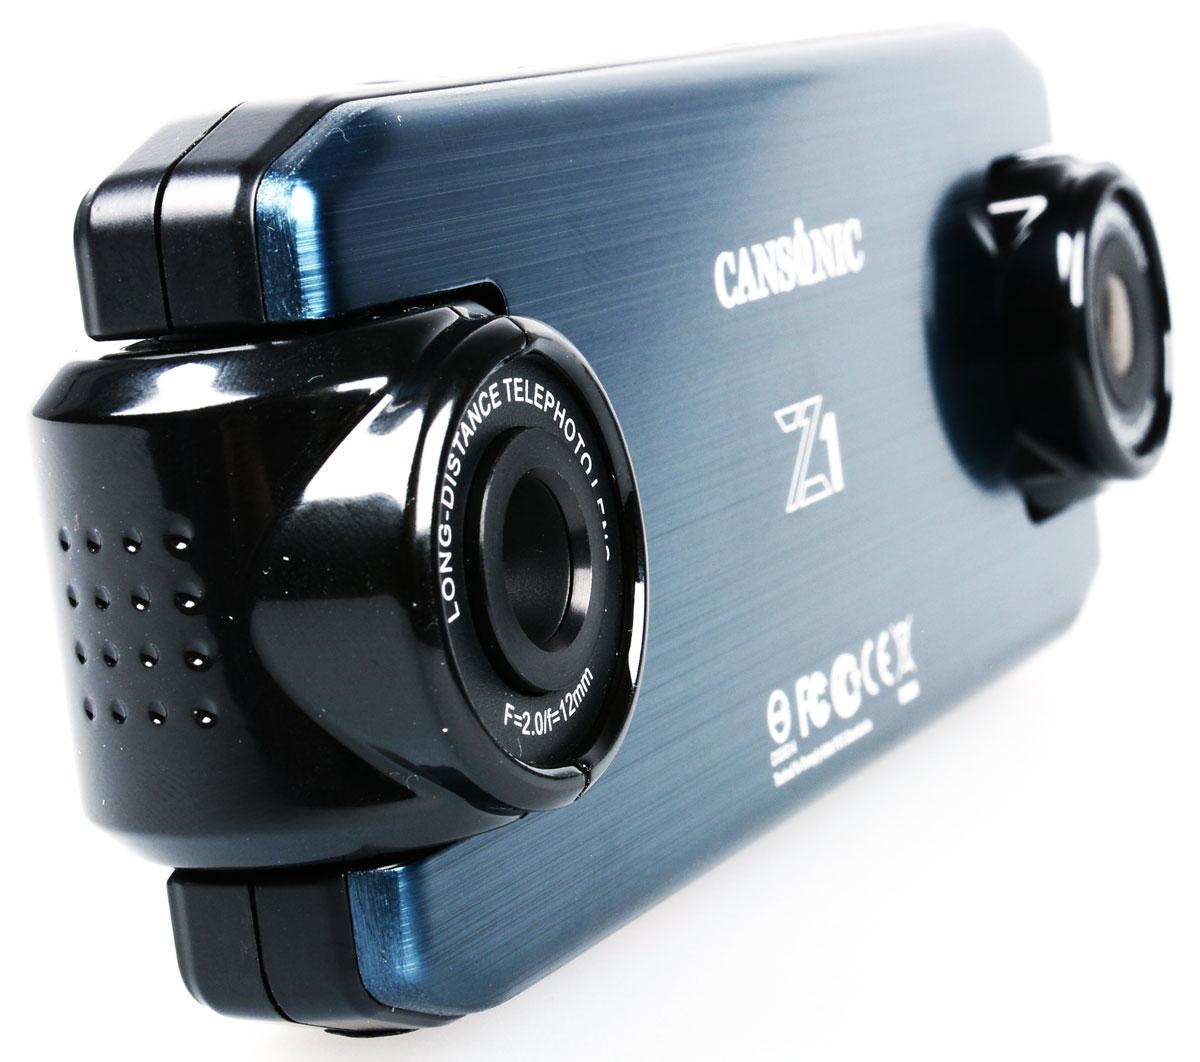 Cansonic Z1 Zoom GPS, Black видеорегистратор